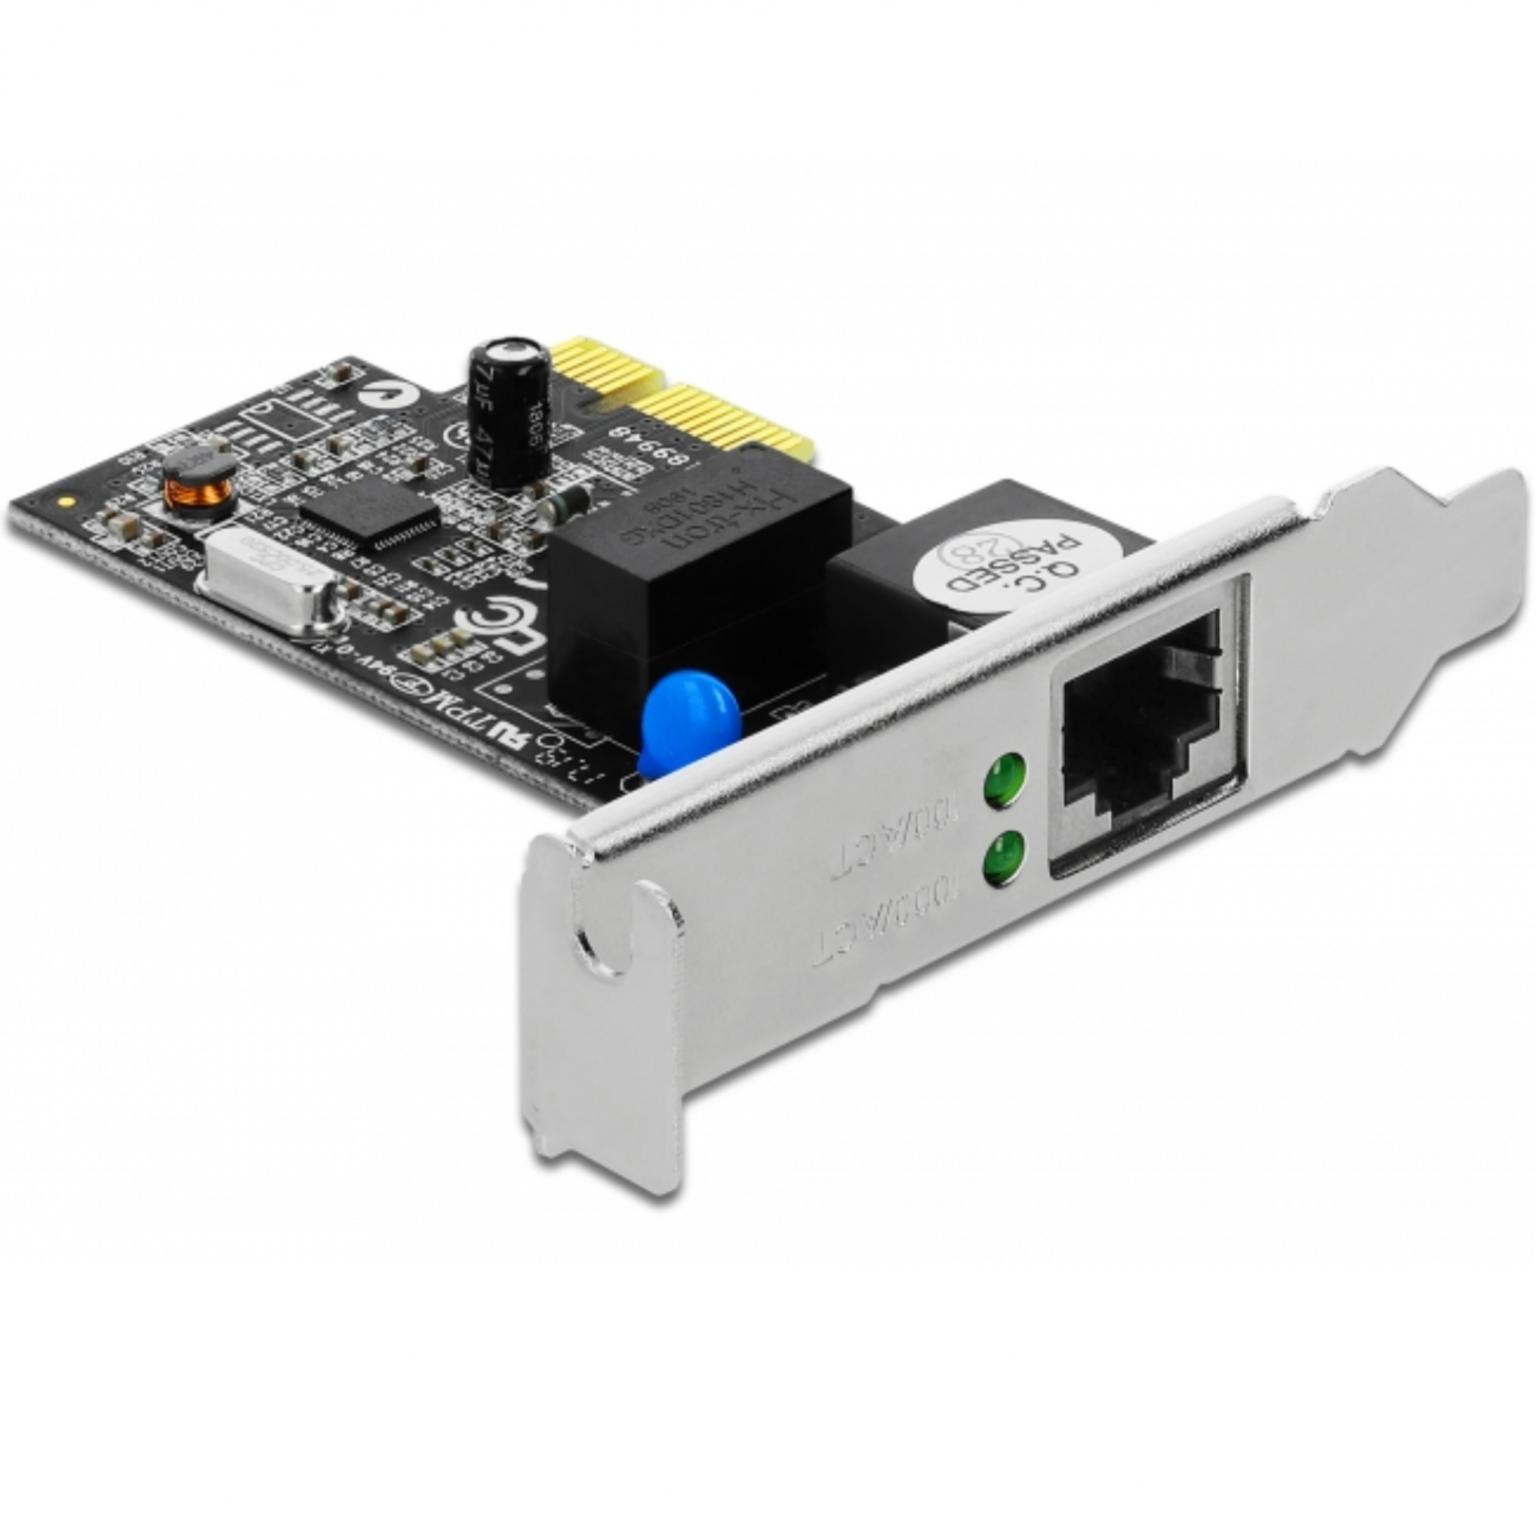 PCI Express Kaart � Bedraad Netwerk Snelheid: 1000 Mbps